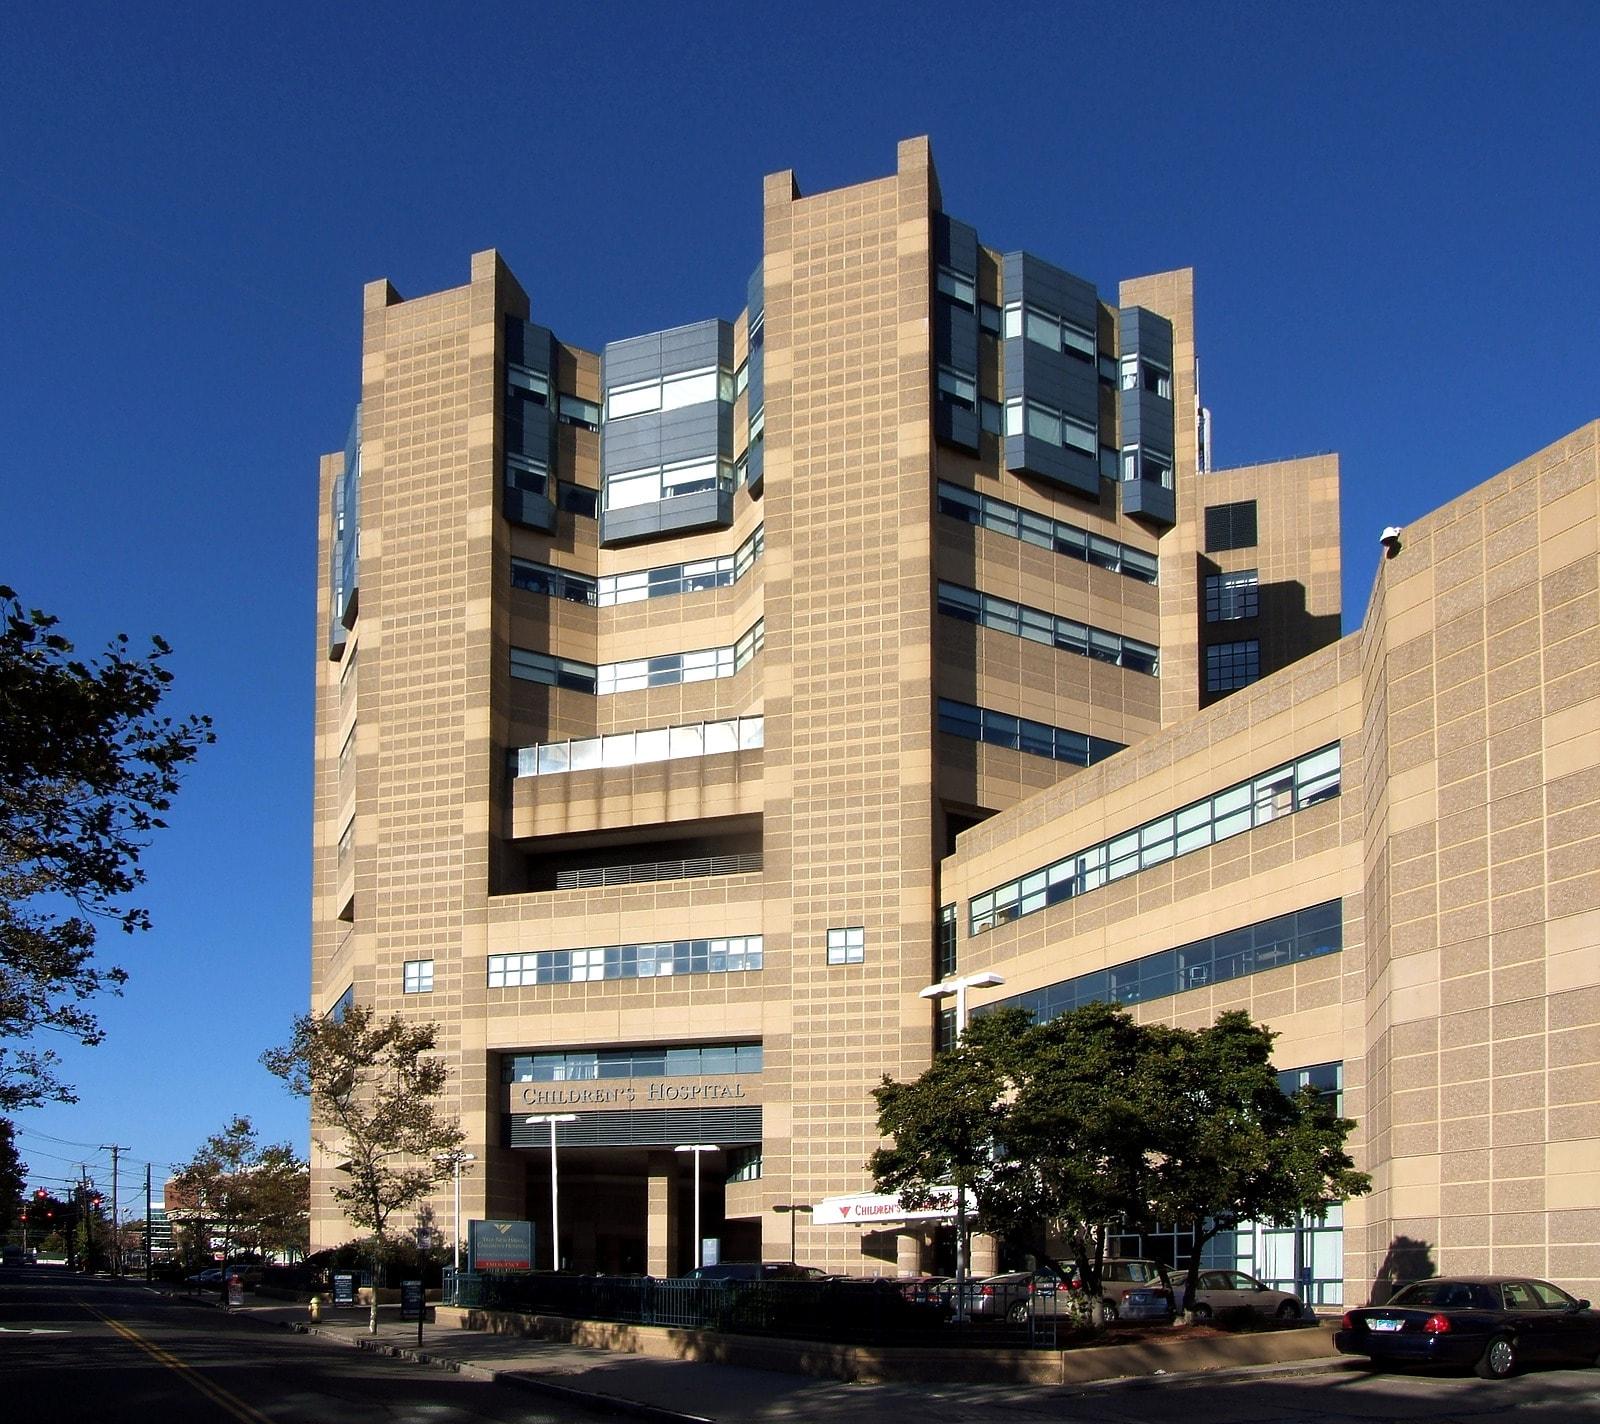 YNHCH is a destination site for pediatric cardiac care.